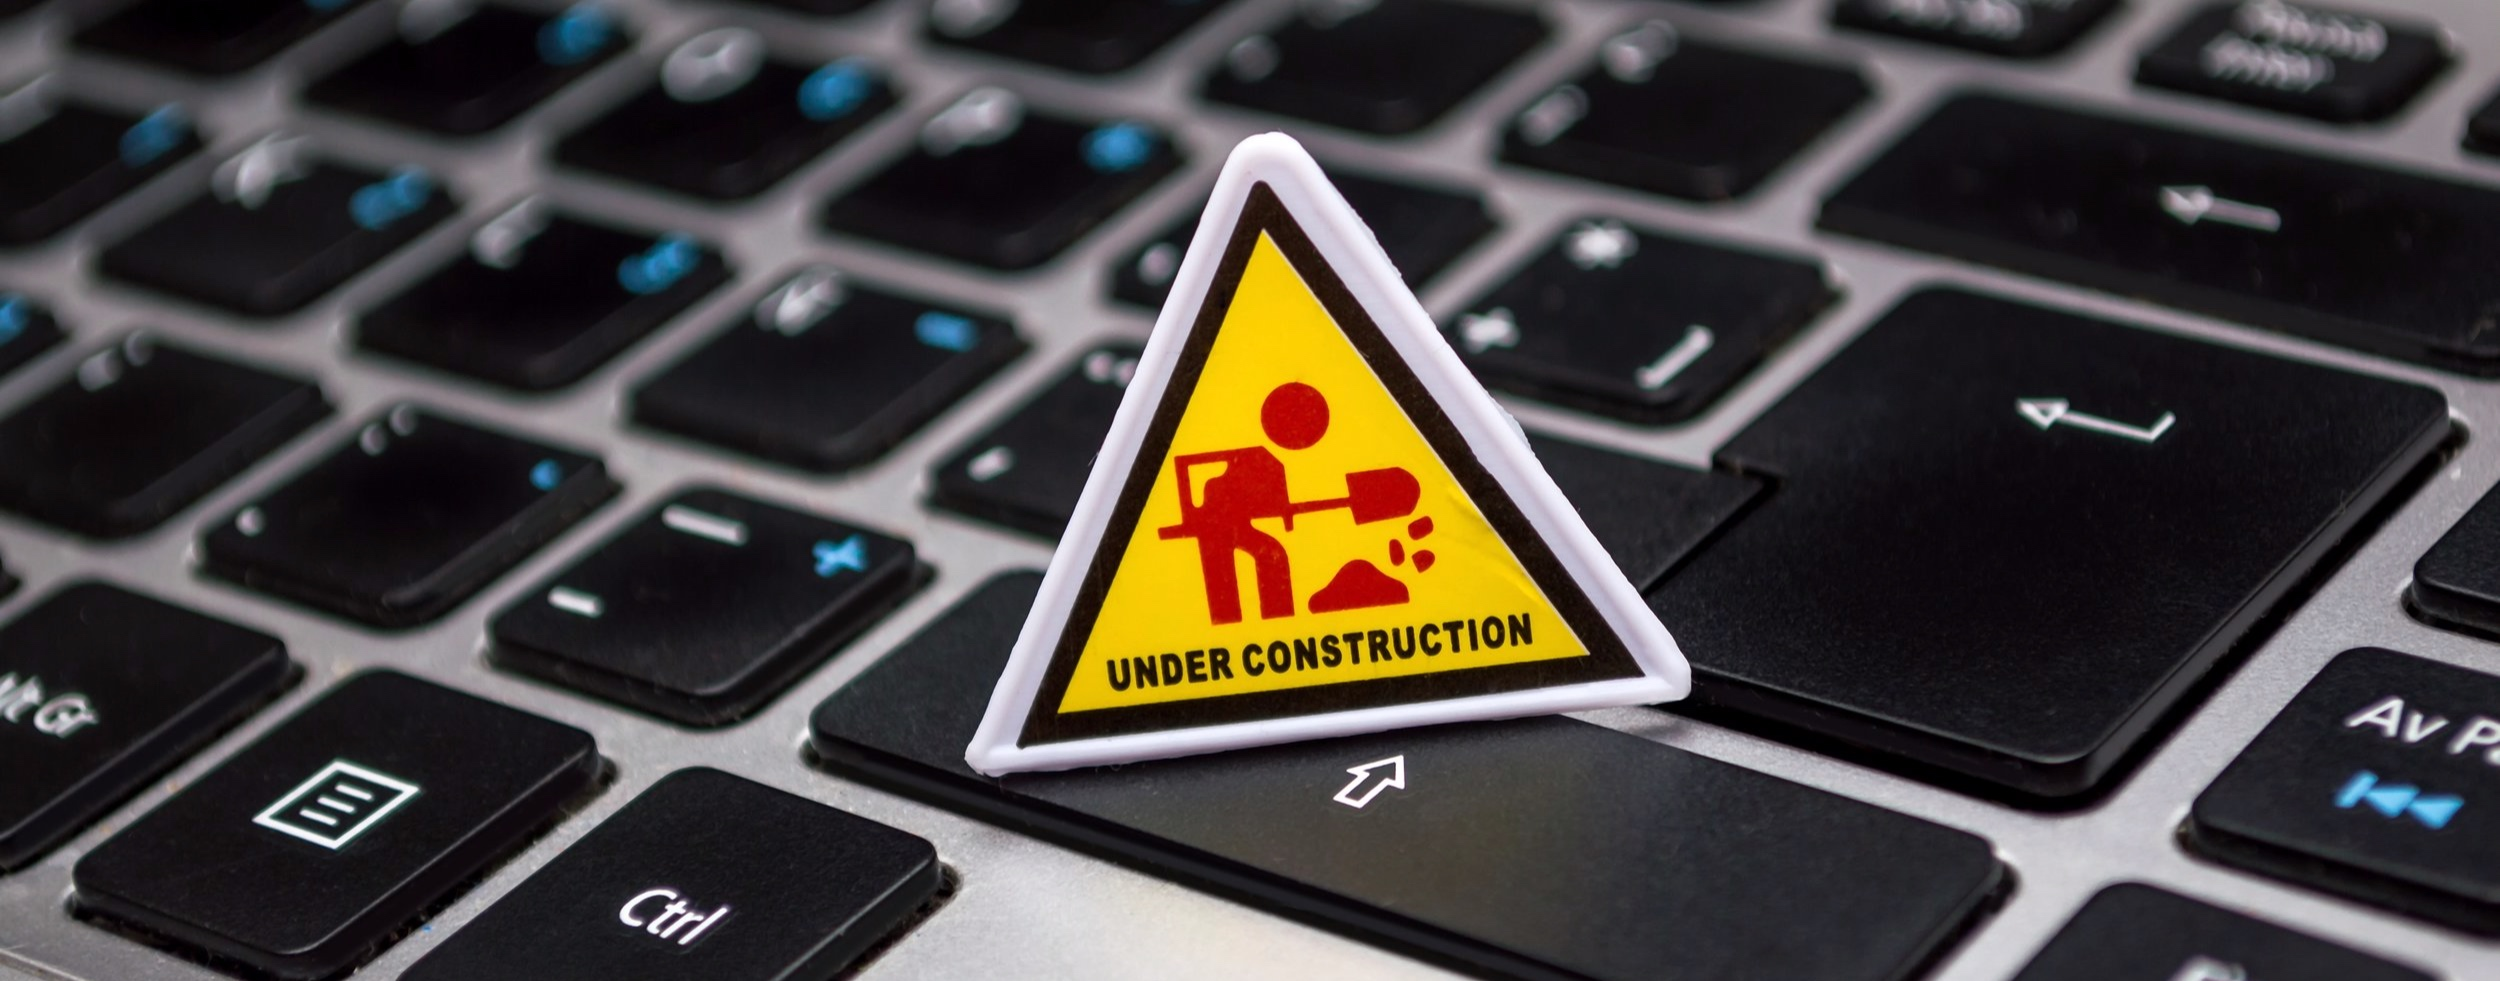 coming-soon-construction-data-211122.jpg